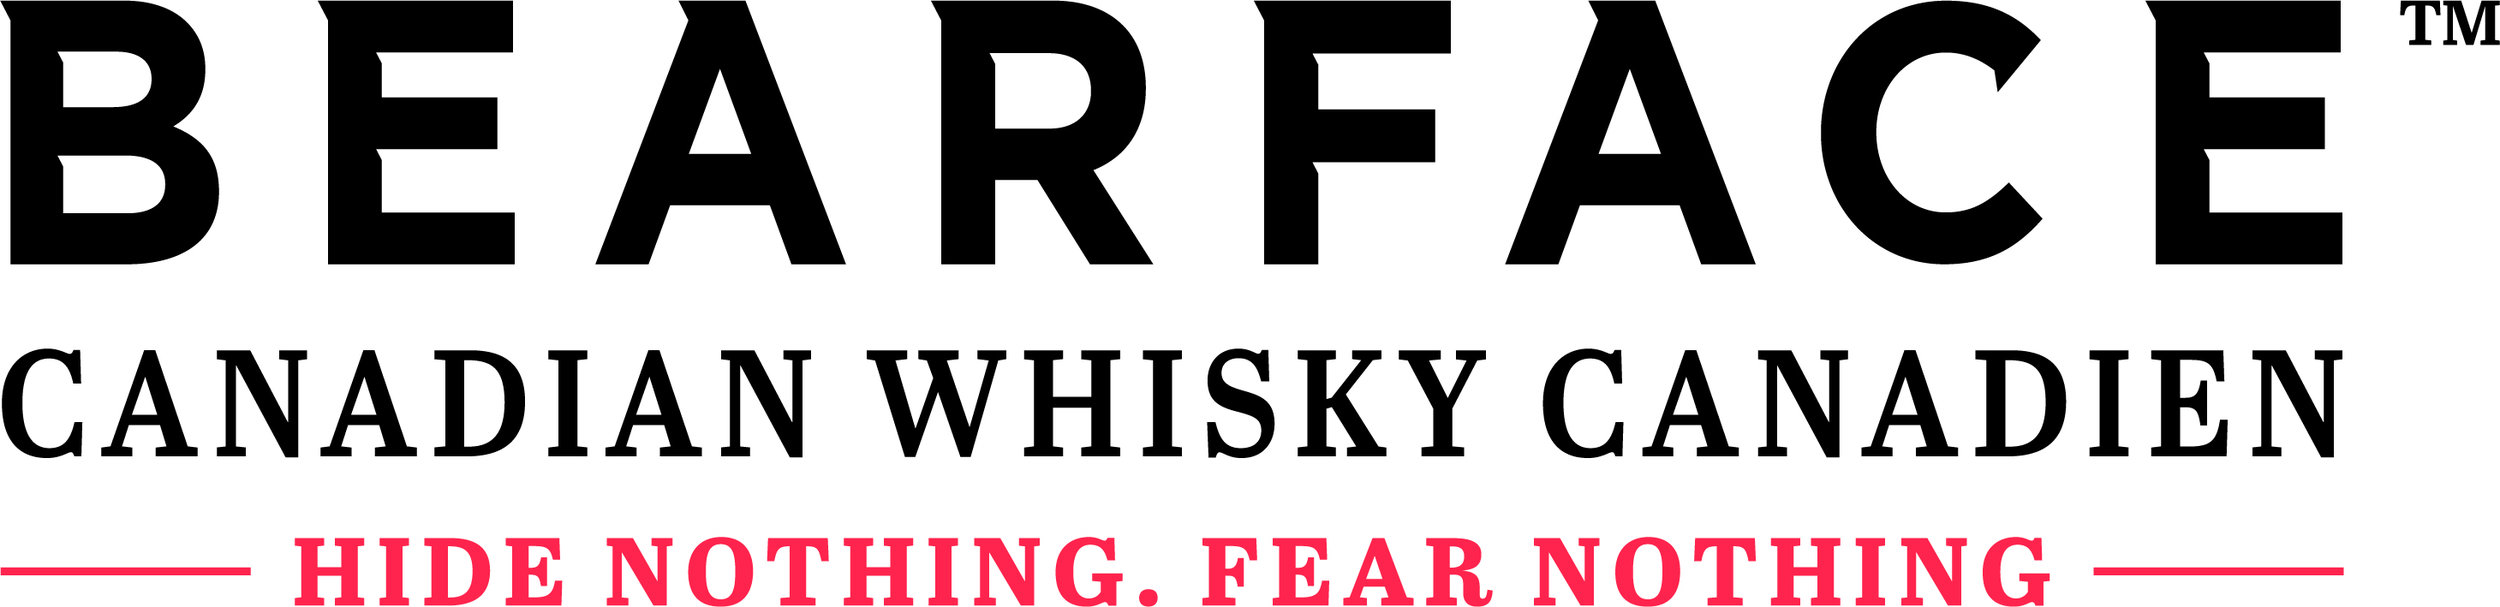 BearFace Brand Logo LockUp _ NoShadow_TM_CMYK.jpg